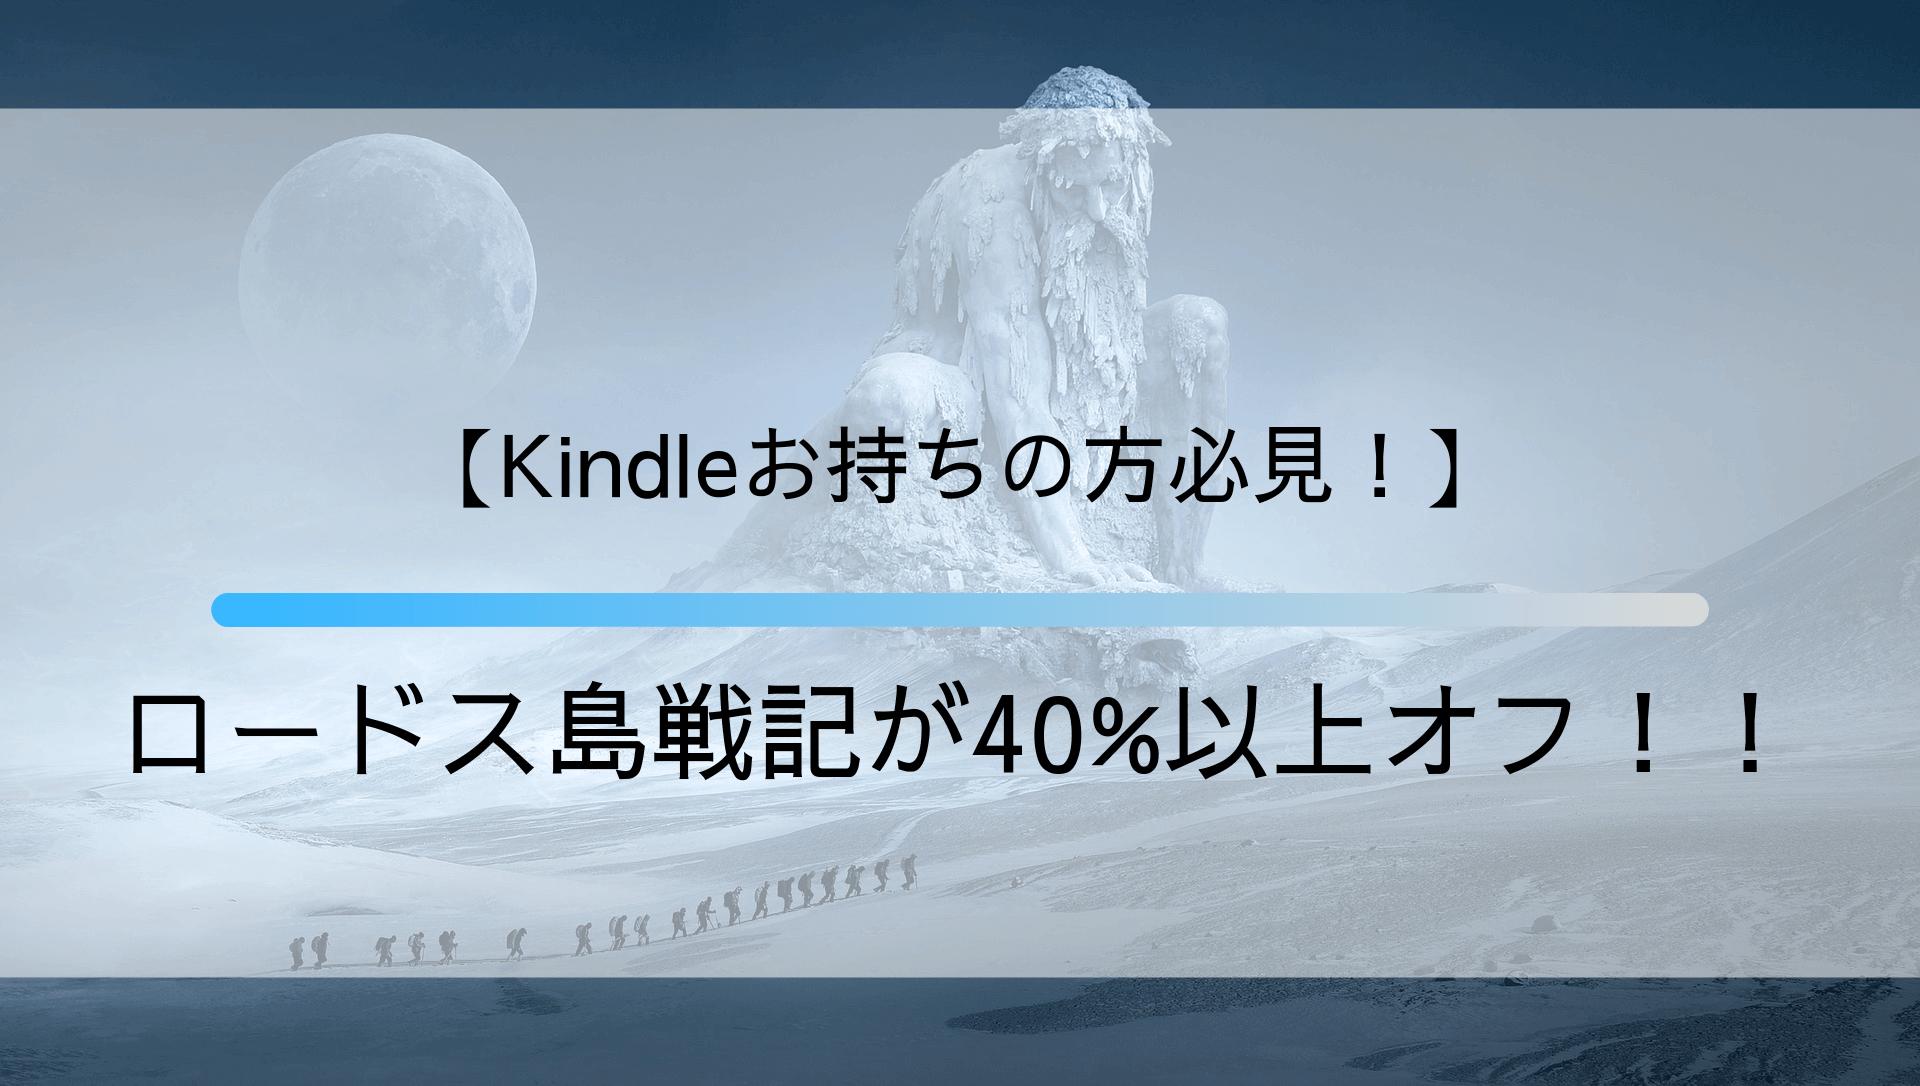 【Kindleお持ちの方必見!】 ロードス島戦記が40%以上オフ!! (1)